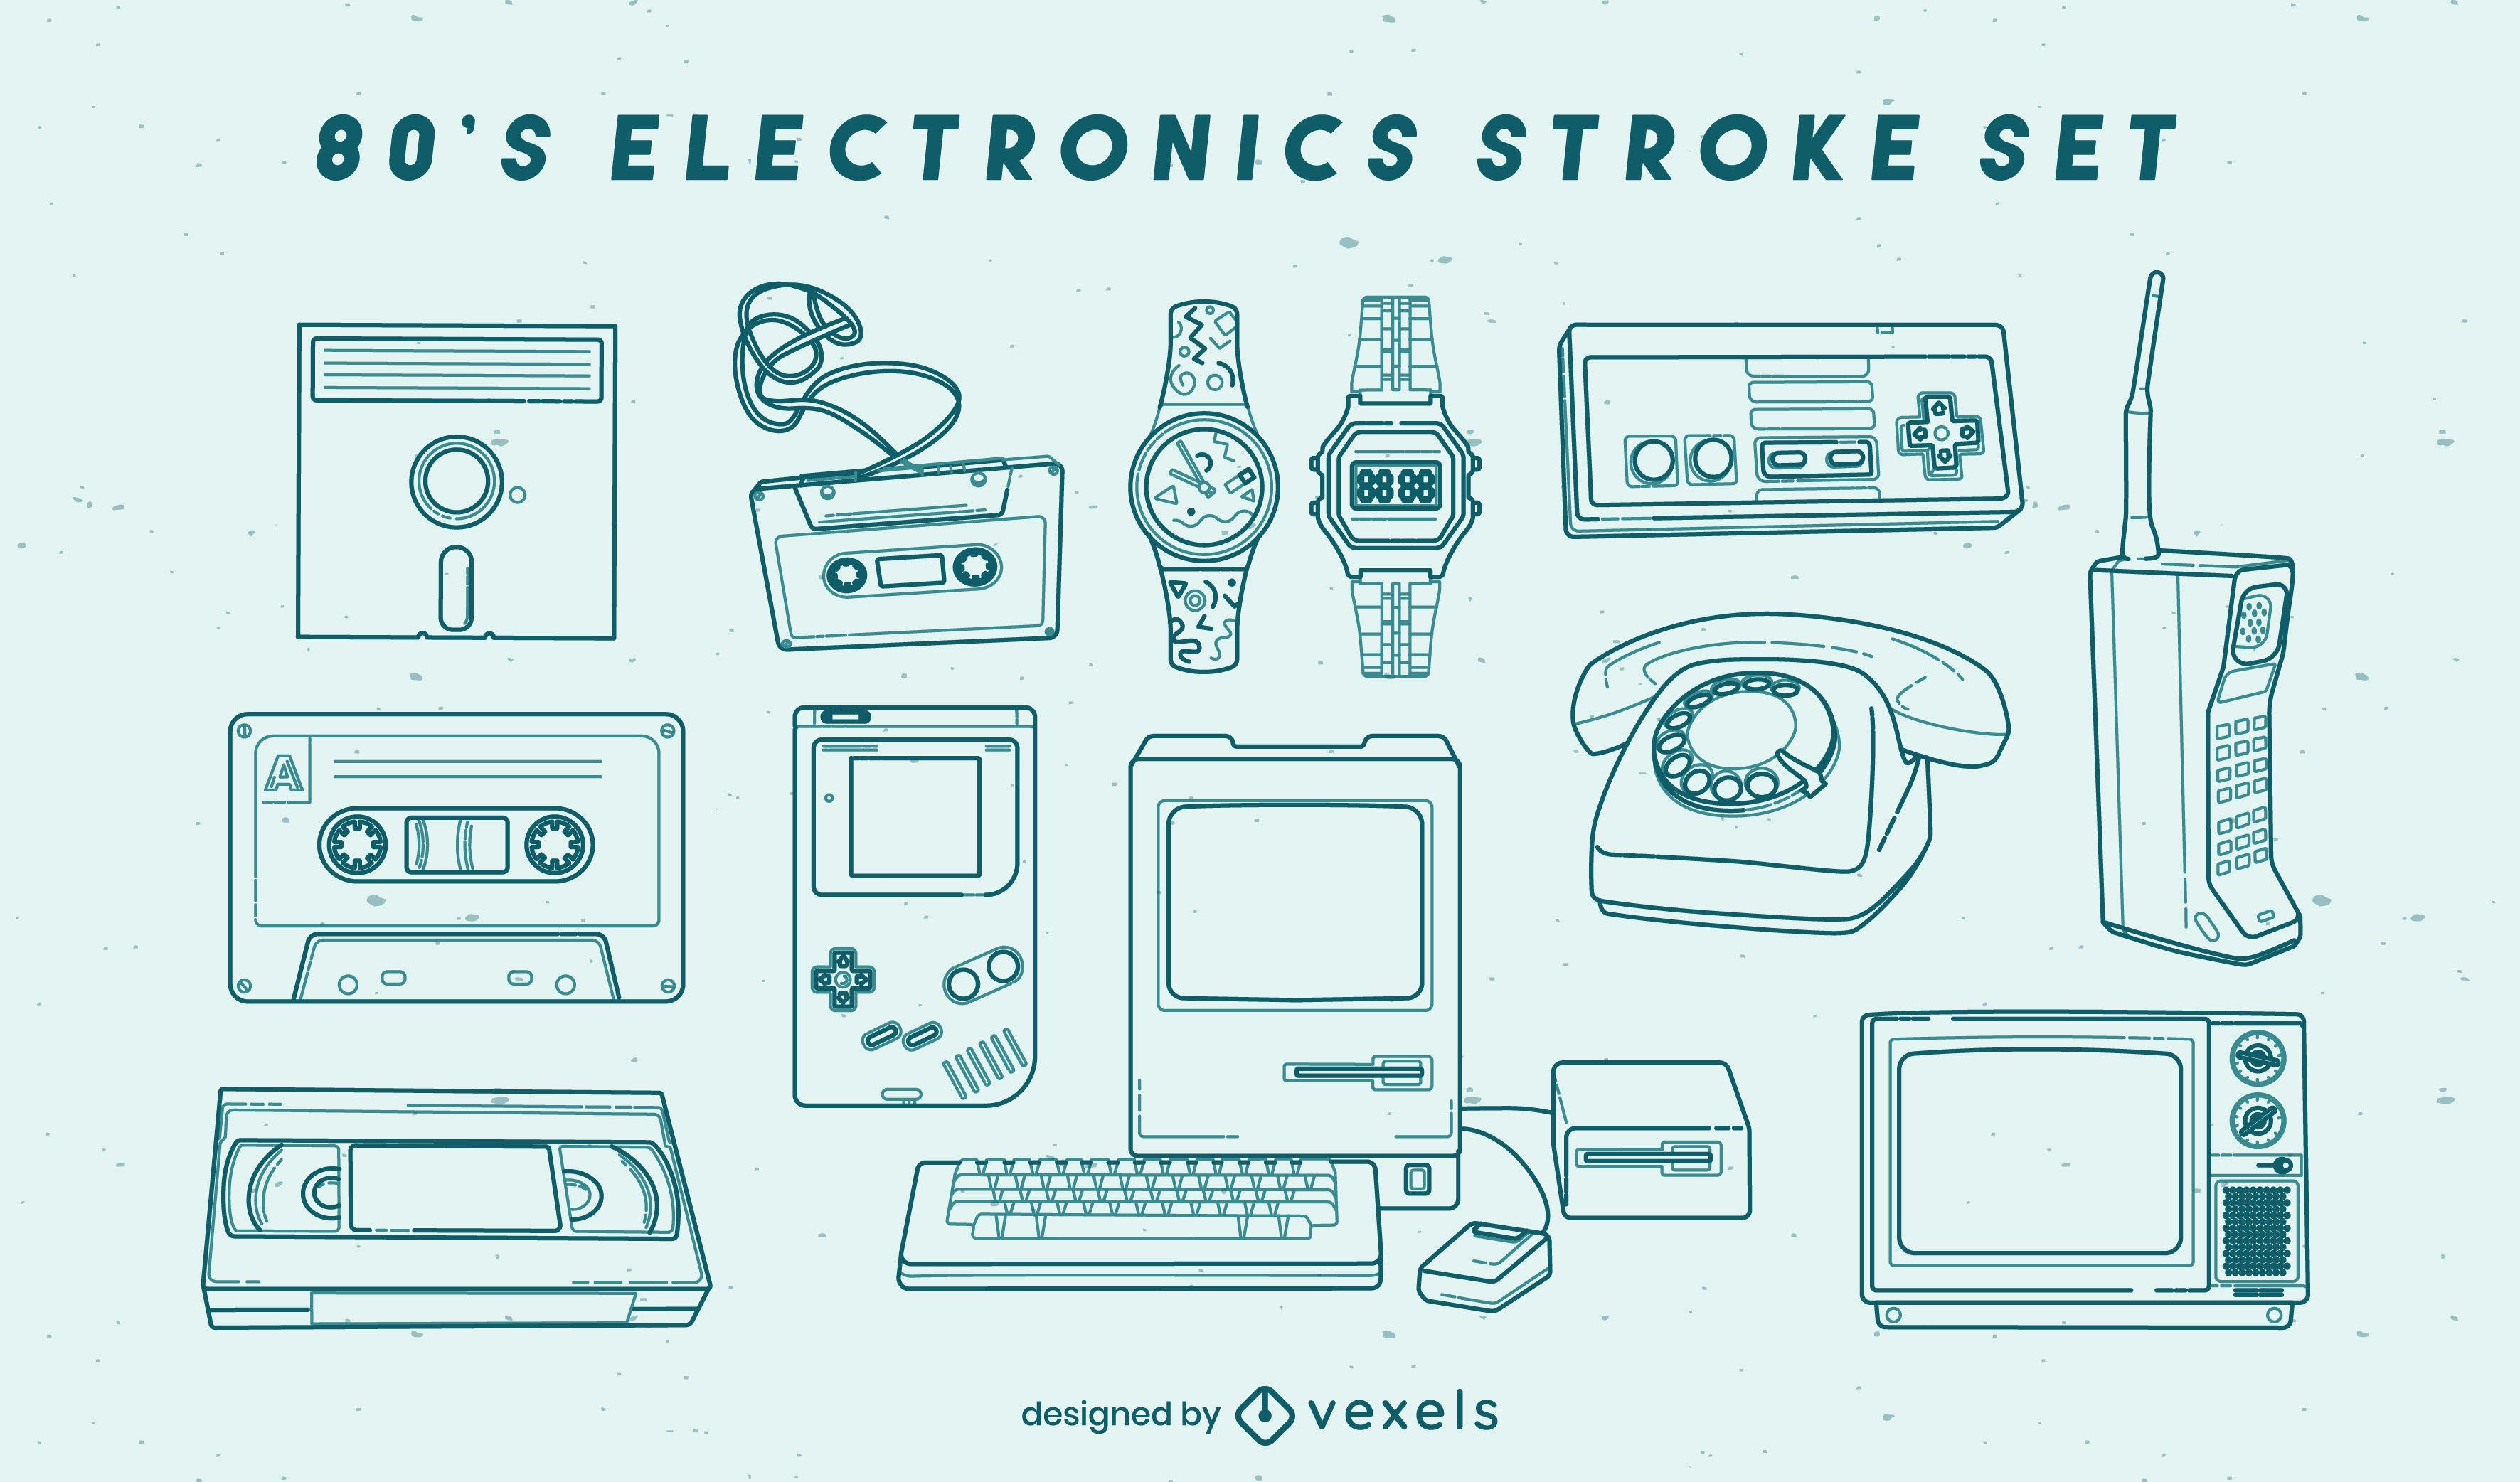 Retro electronic elements stroke set